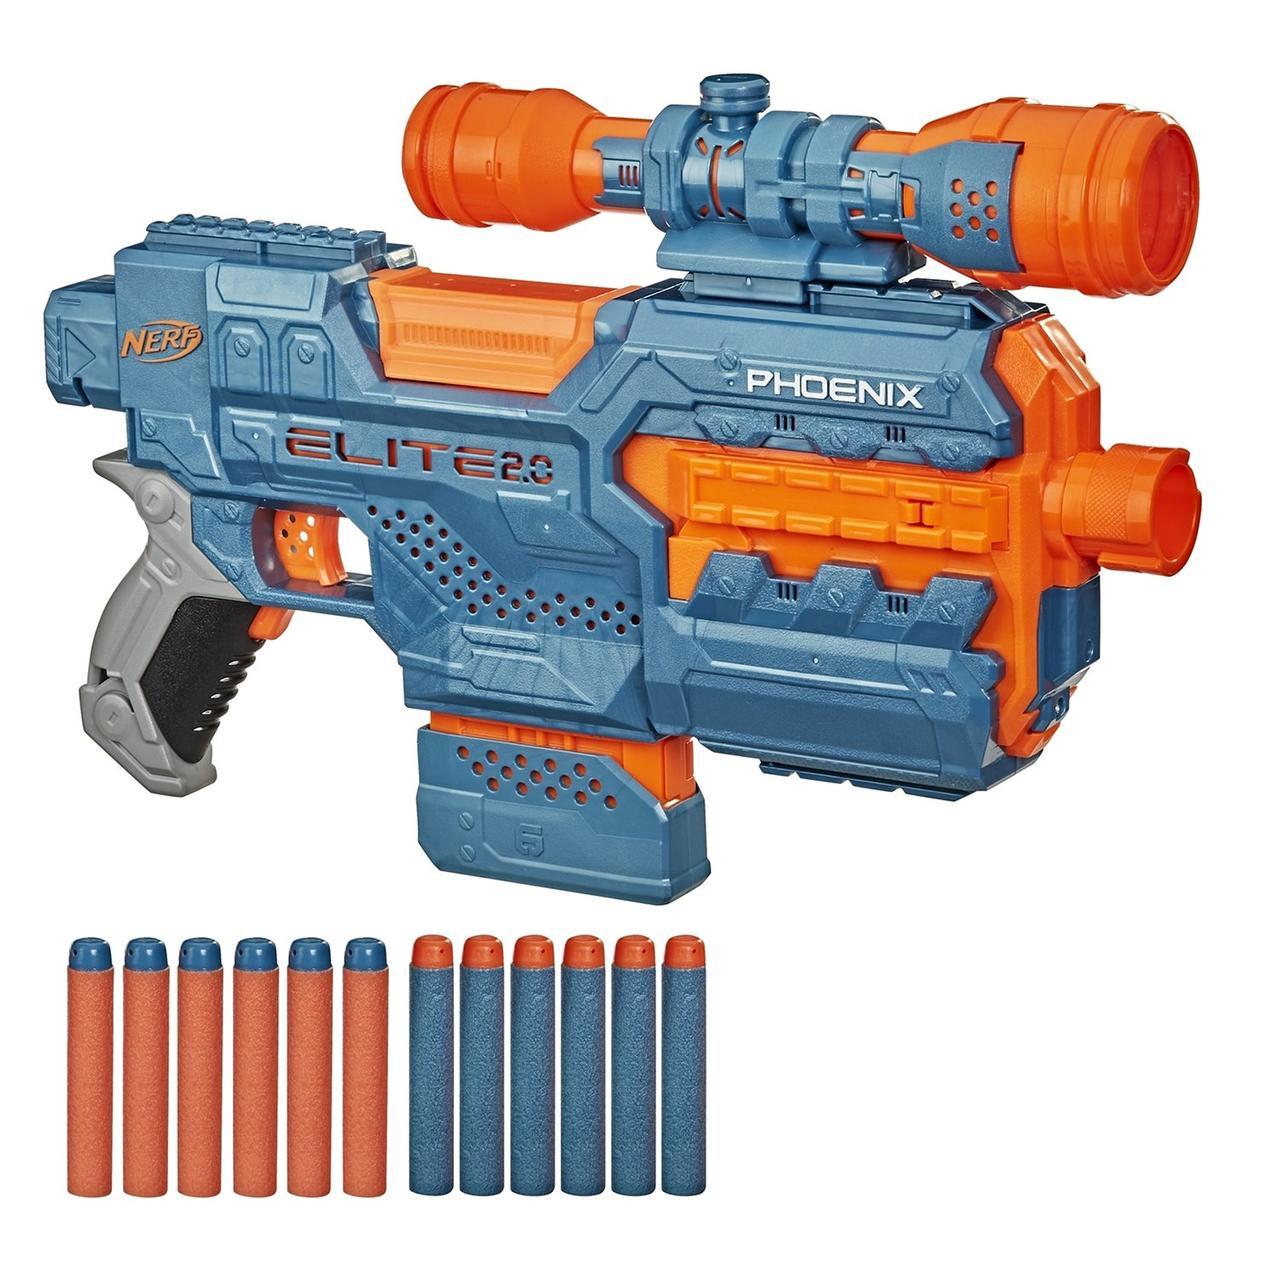 Hasbro Nerf N-Strike Elite 2,0 Автоматический Бластер Нерф Феникс ЦС-6 с прицелом (Phoenix CS-6)